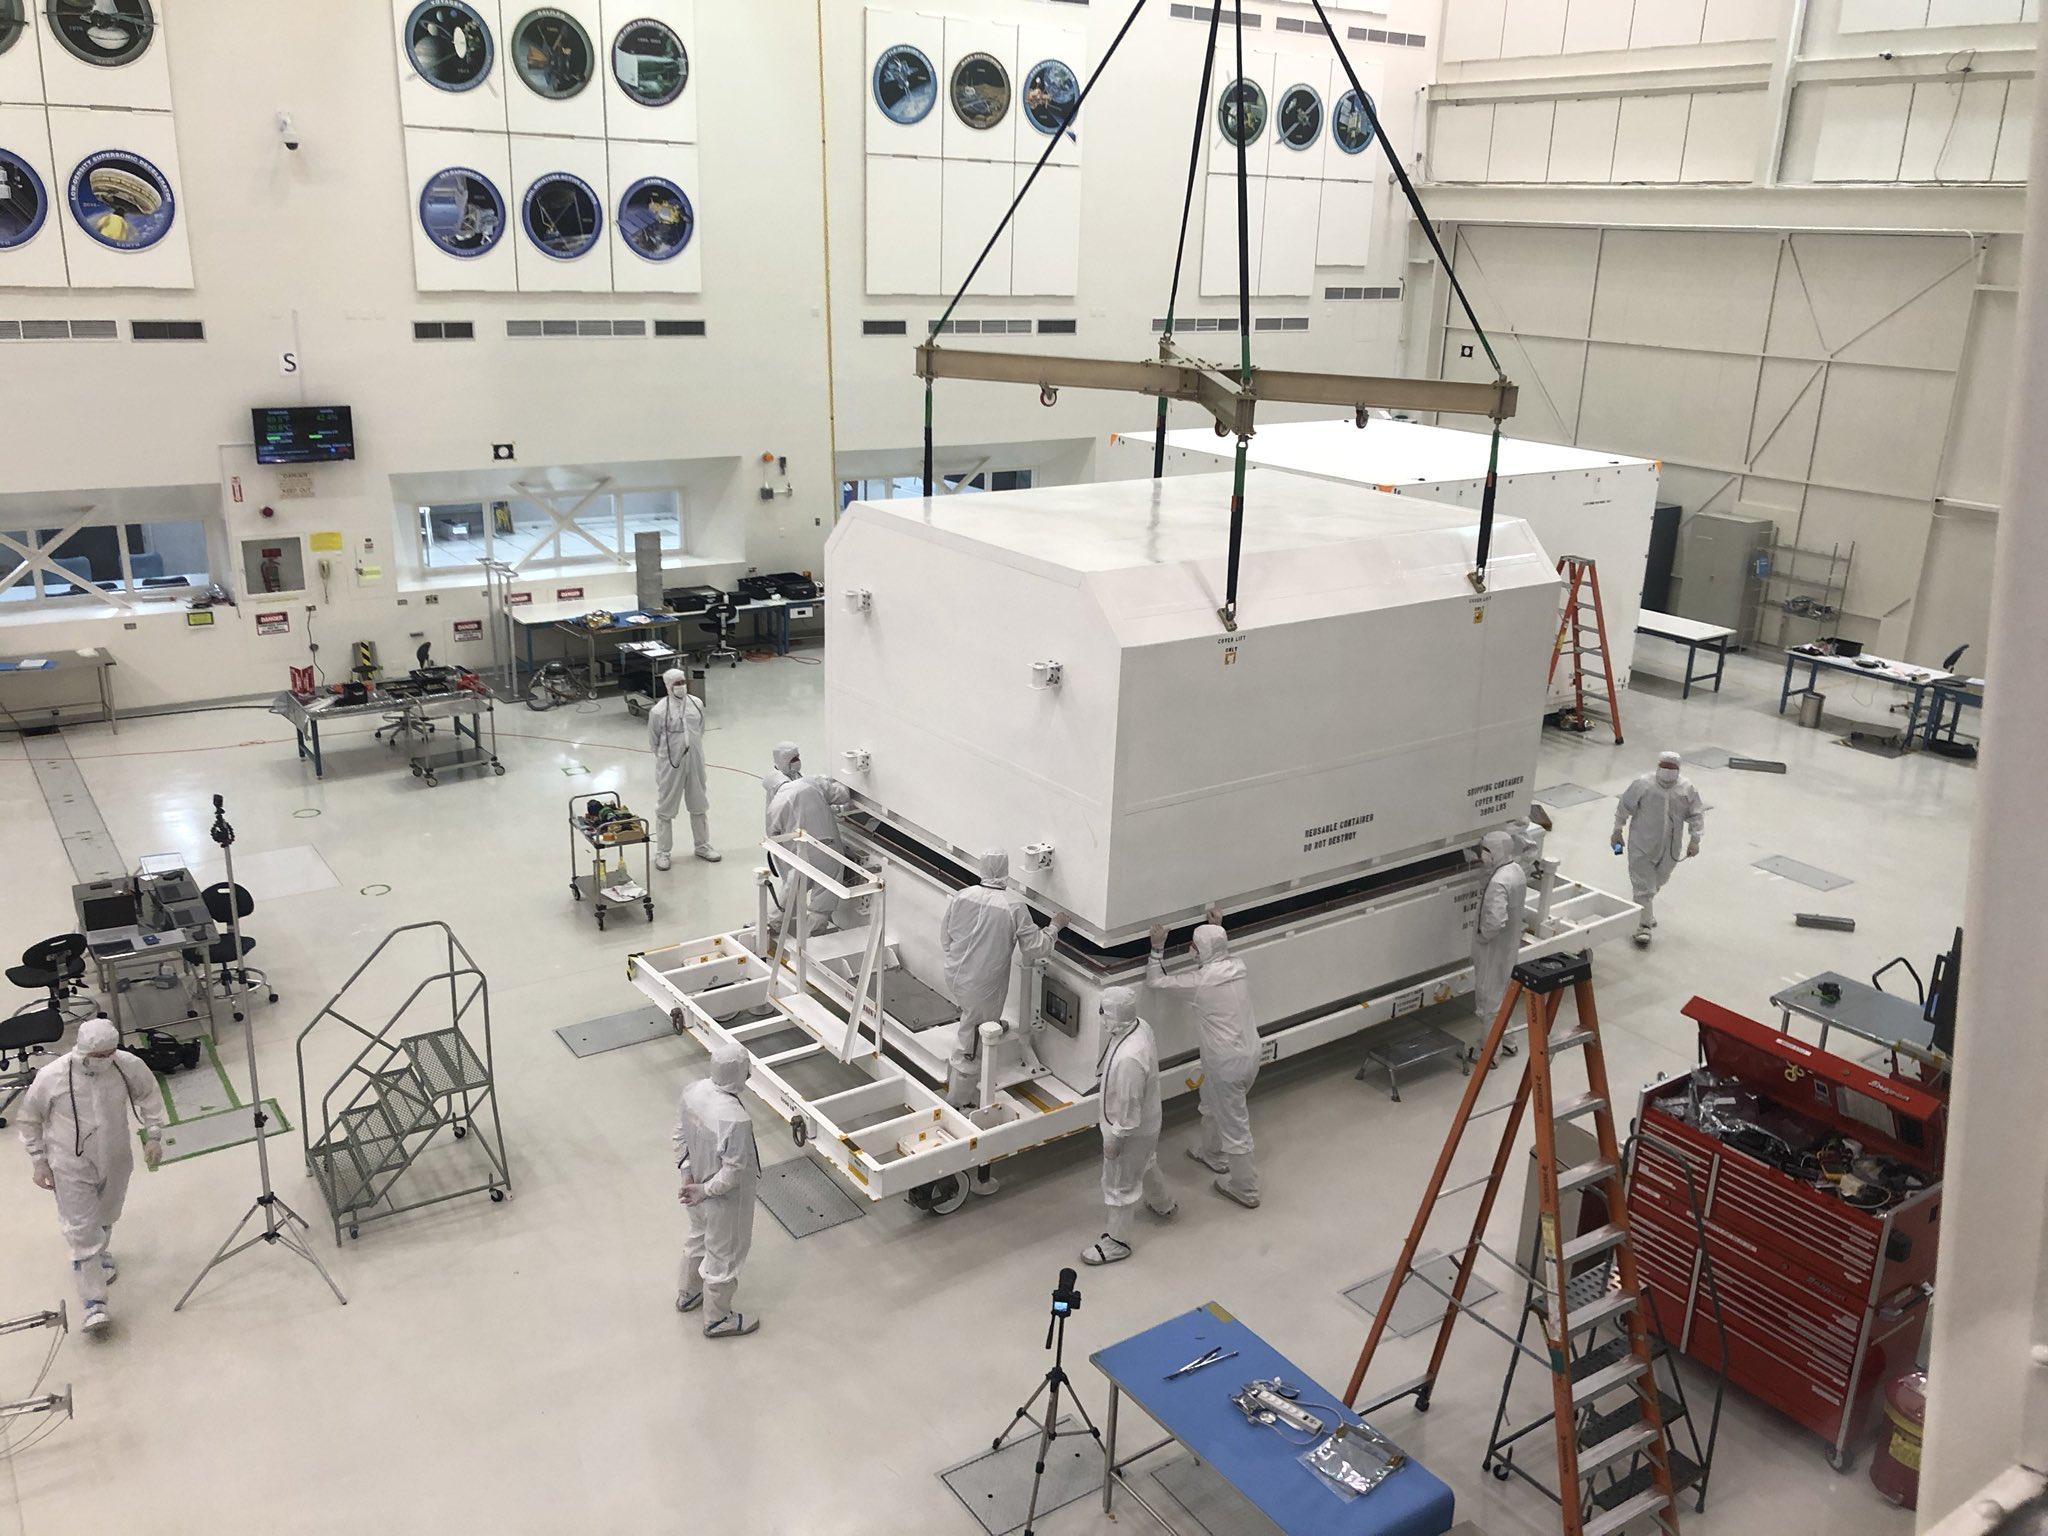 Préparation du rover Mars 2020 (Curiosity 2) - 17.07.2020 - Page 11 EQKa_BmWoAAaxoy?format=jpg&name=4096x4096